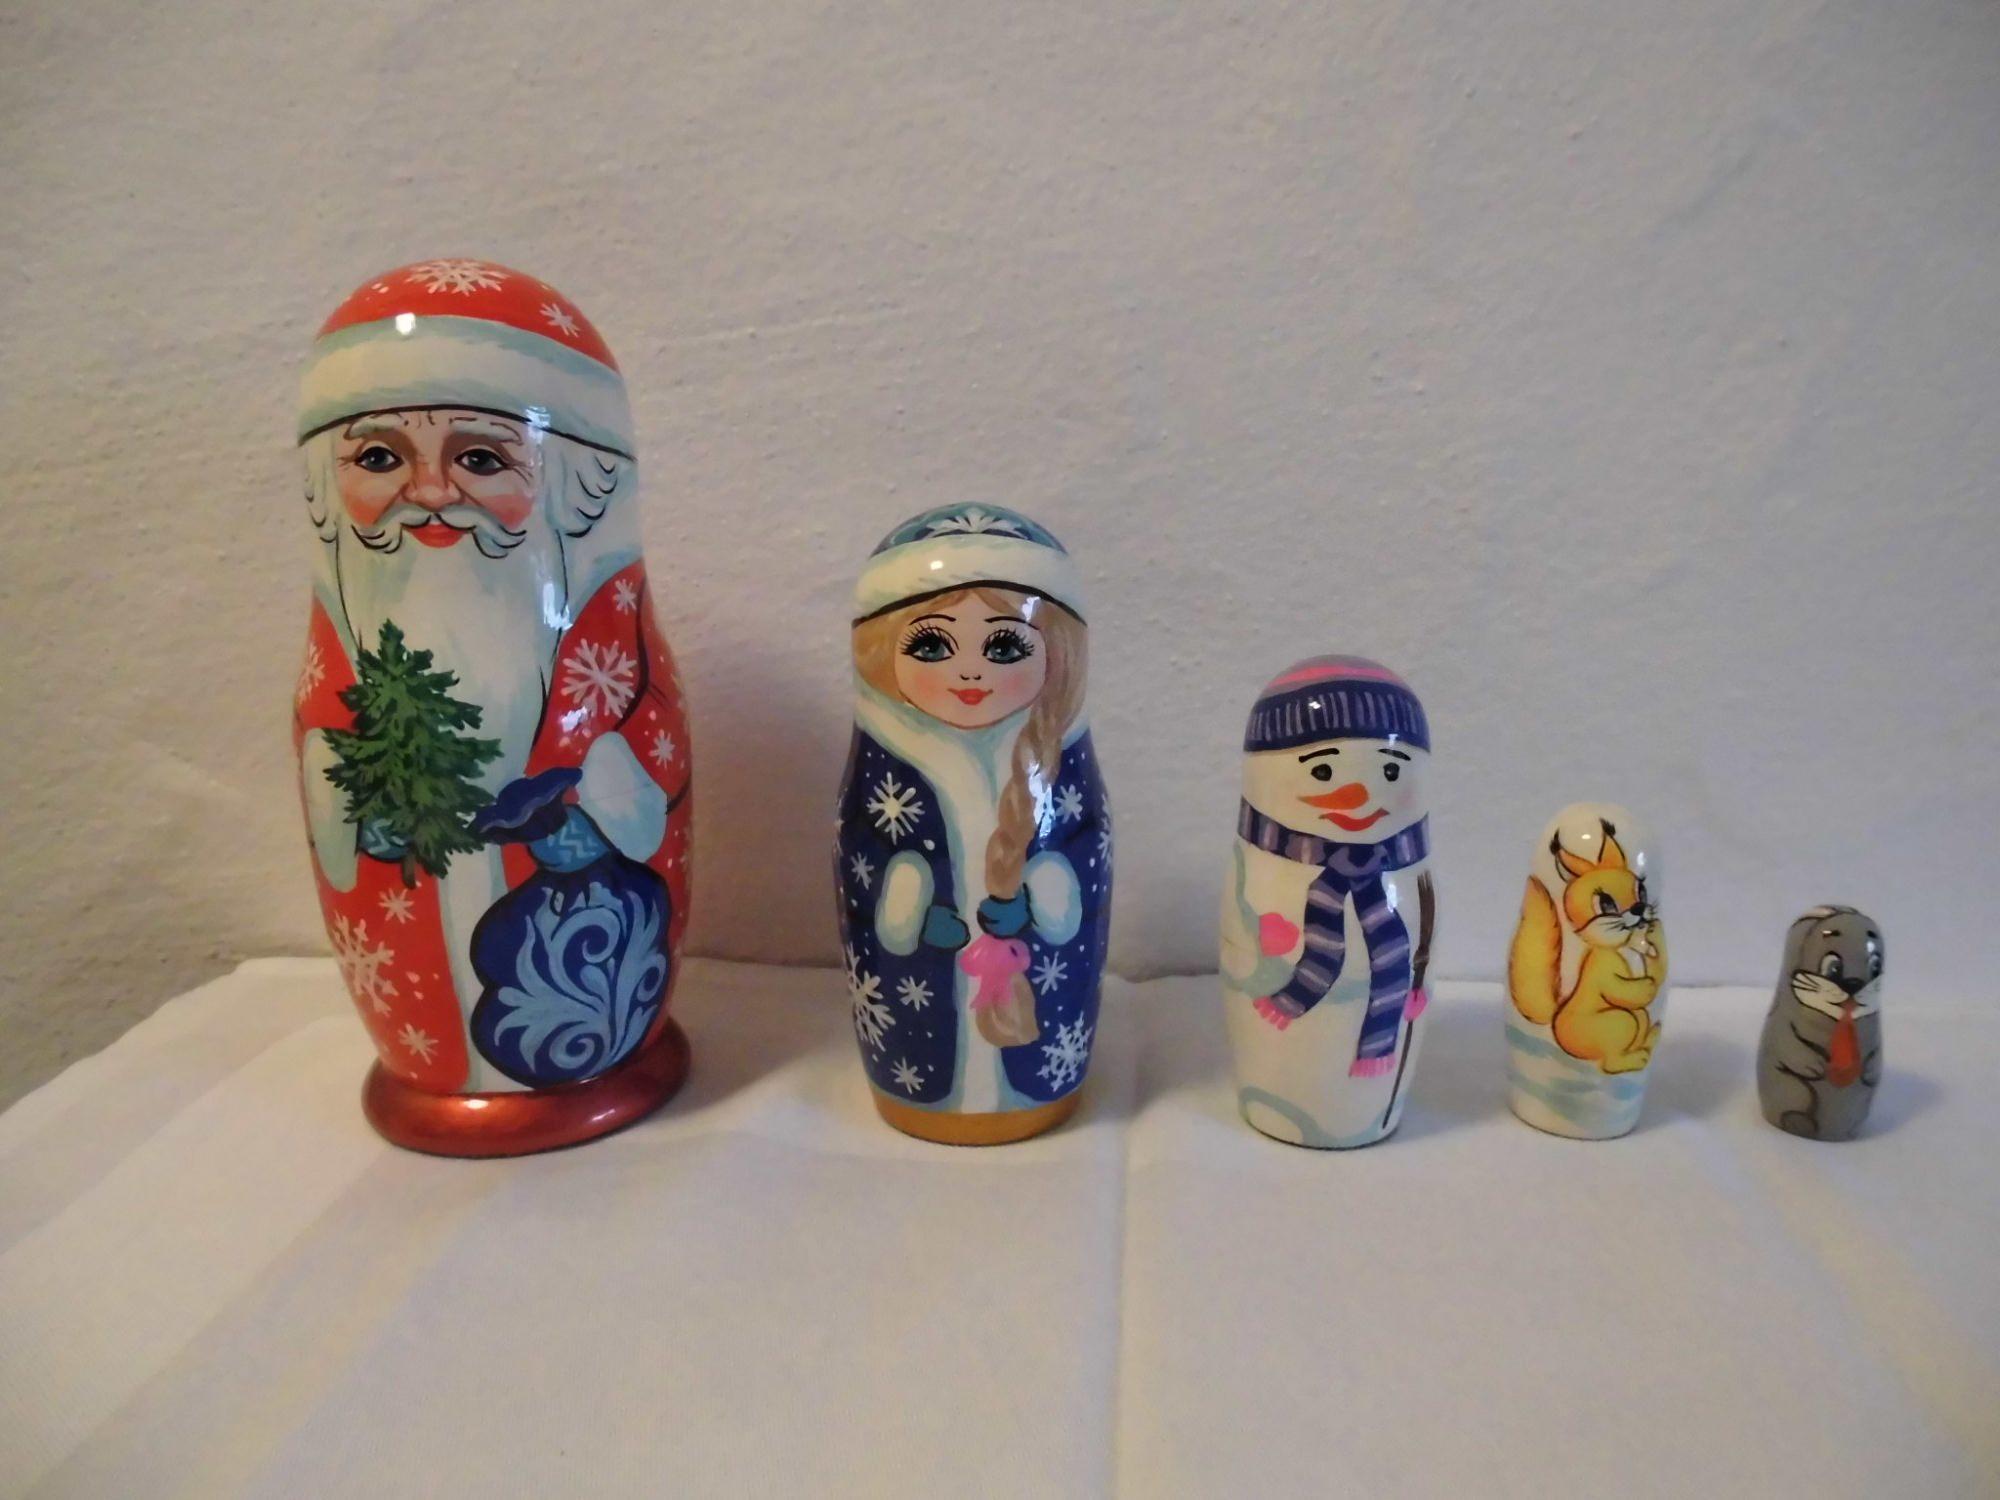 - Handgearbeiteter Nikolaus / St.Claus, Holz, 5-er Set, Unikat - Handgearbeiteter Nikolaus / St.Claus, Holz, 5-er Set, Unikat